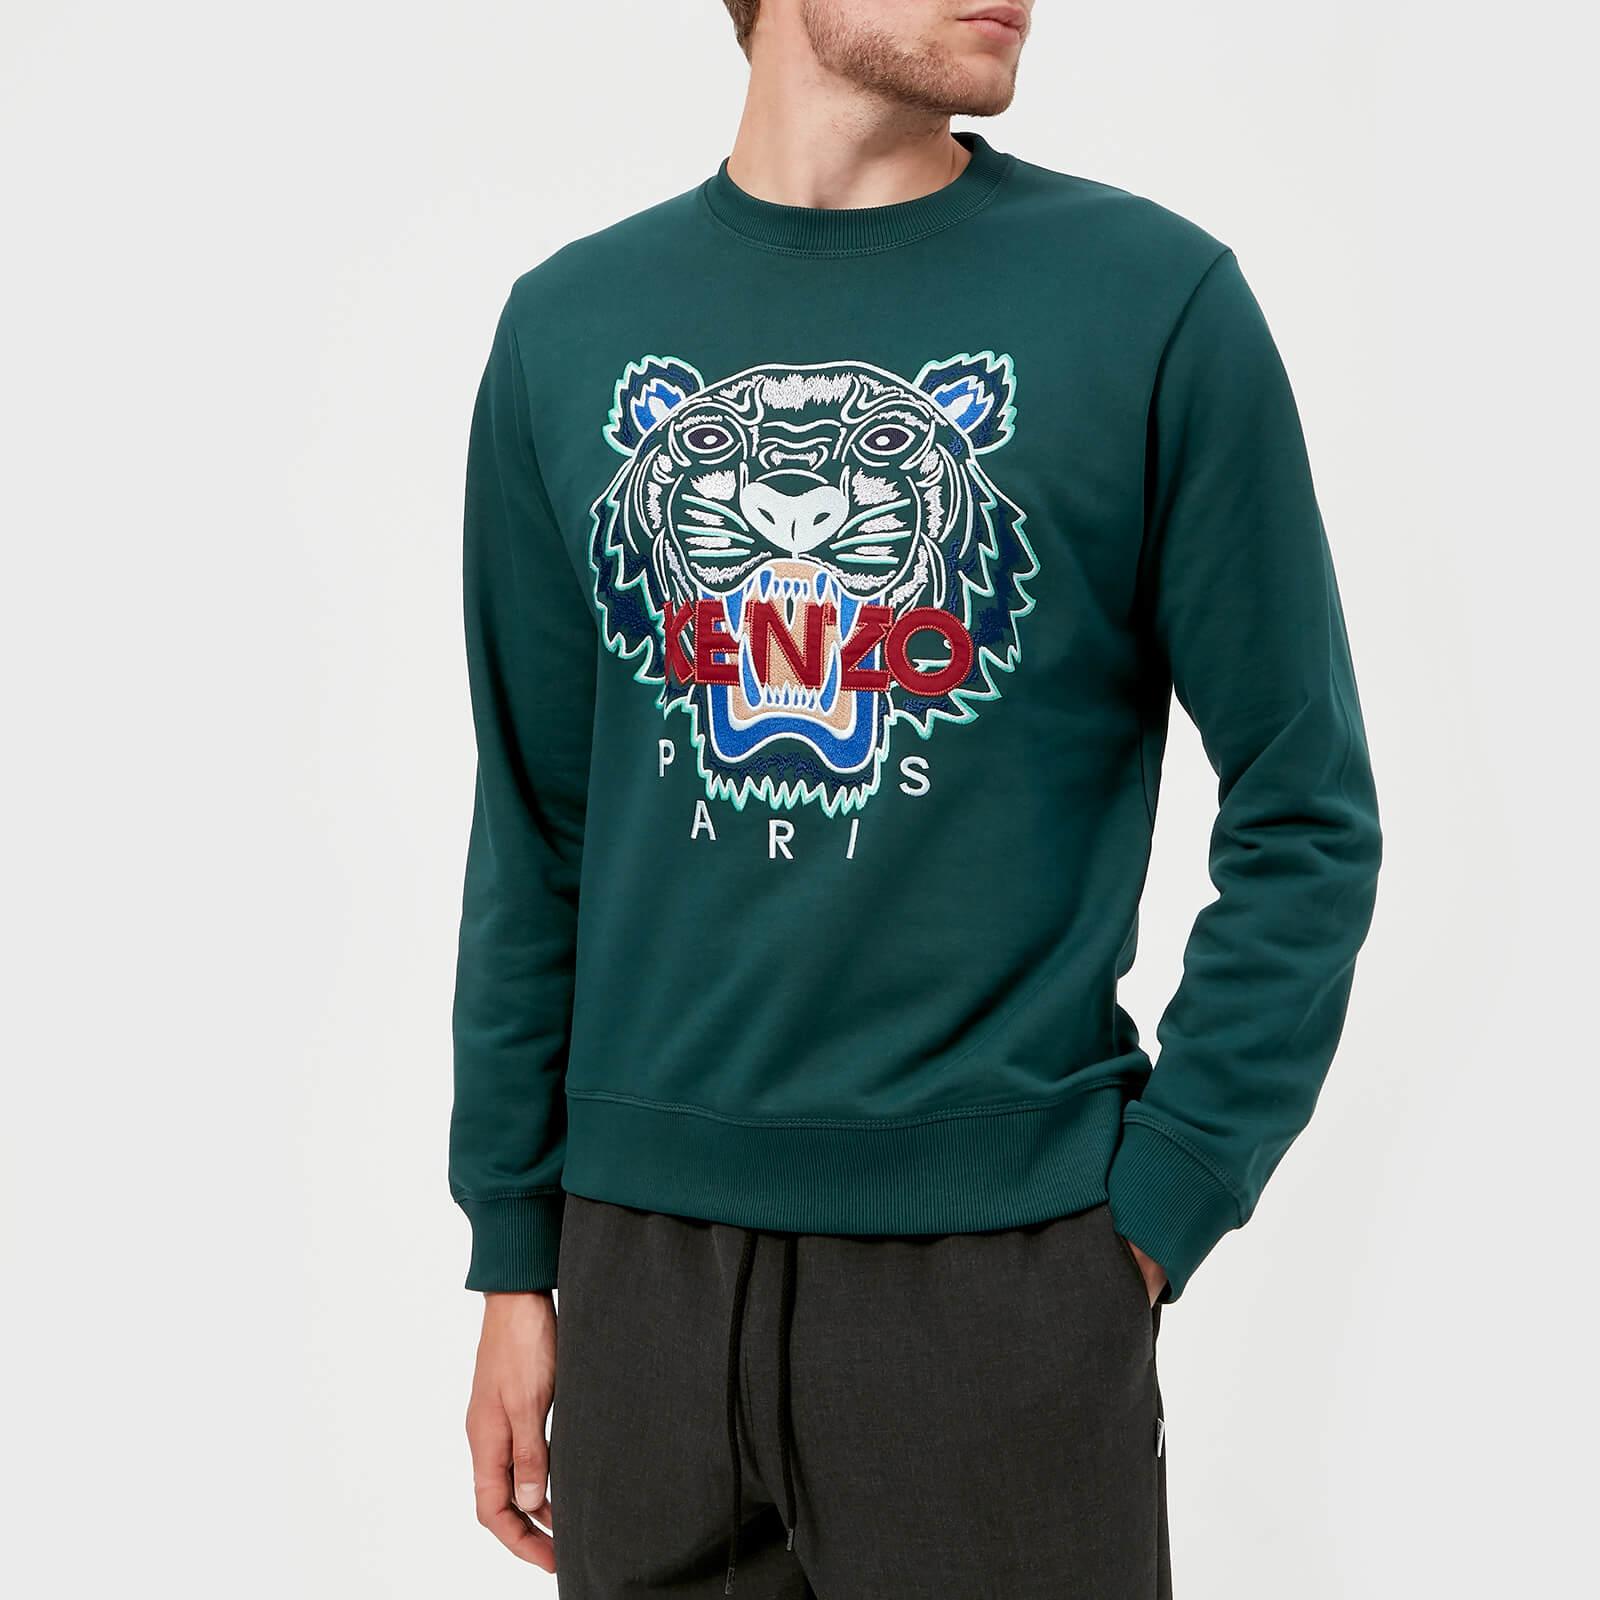 99ada1fa KENZO Men's Classic Tiger Sweatshirt - Pine Green - Free UK Delivery over £ 50